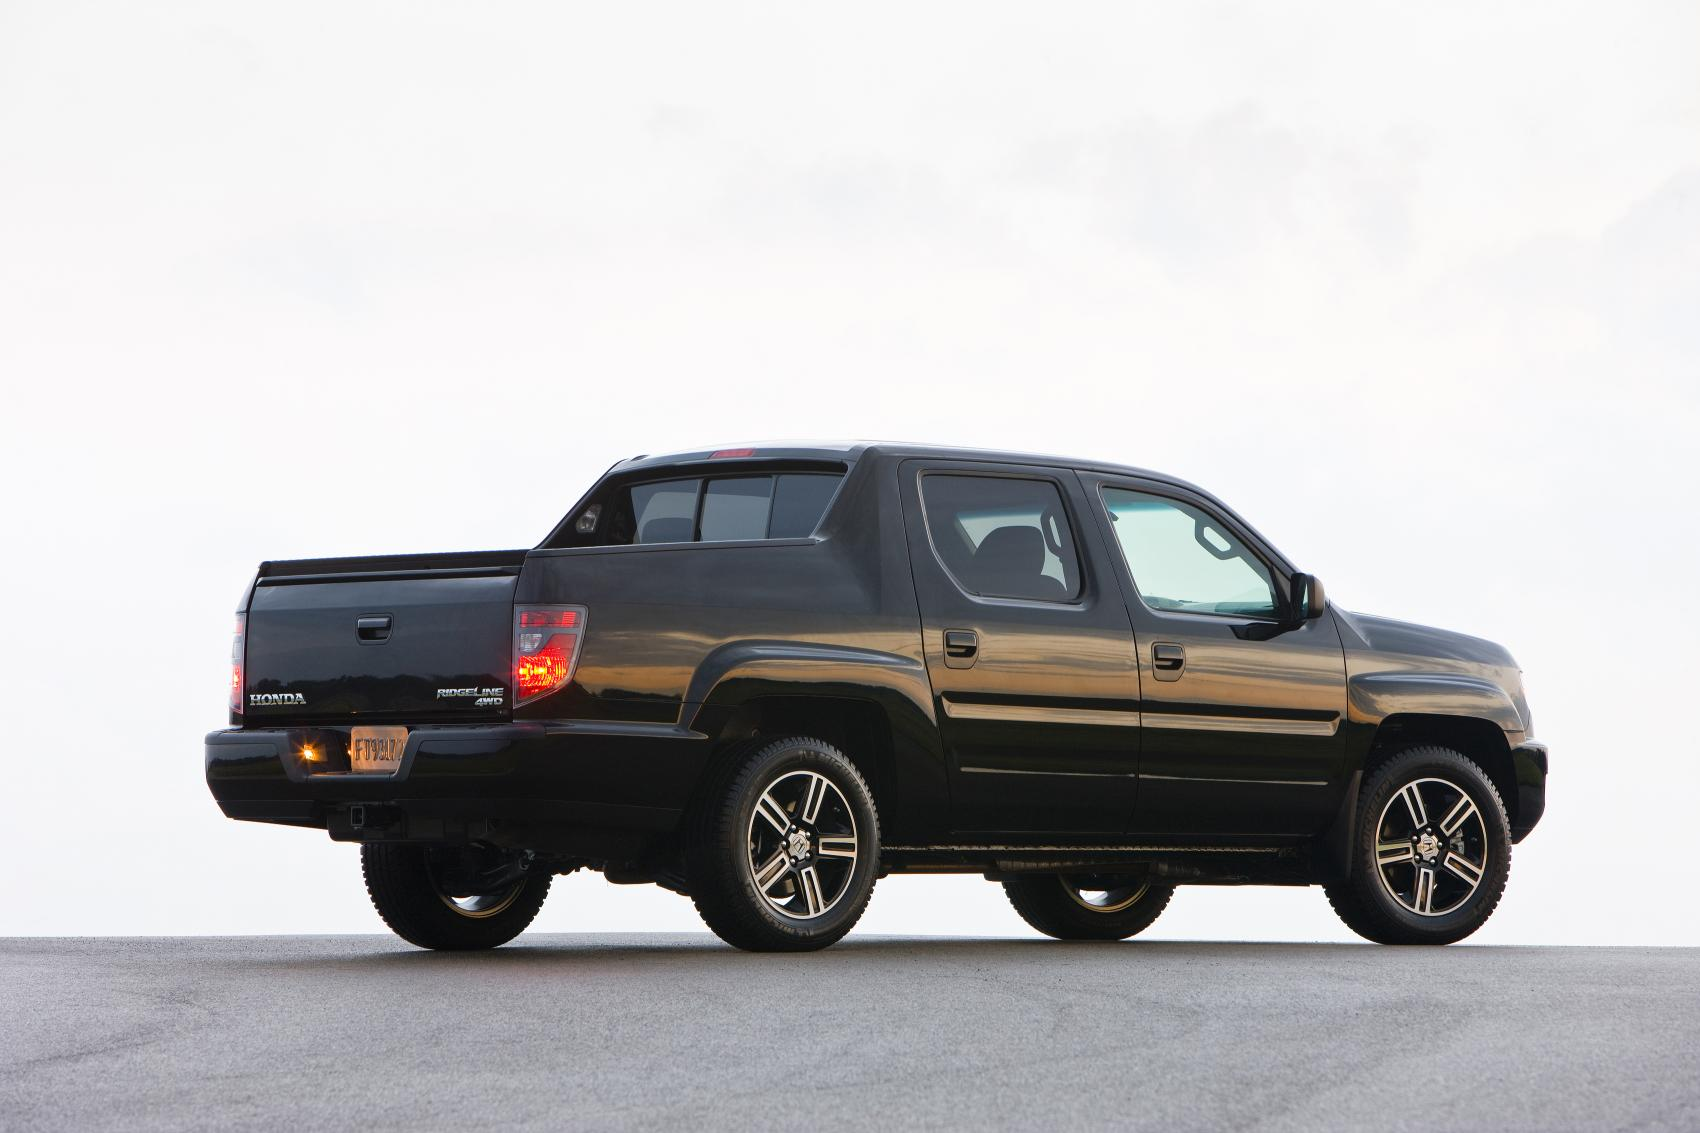 Toyota Tacoma Evolution >> 2014 Honda Ridgeline Pricing, New Special Edition Model Announced - autoevolution